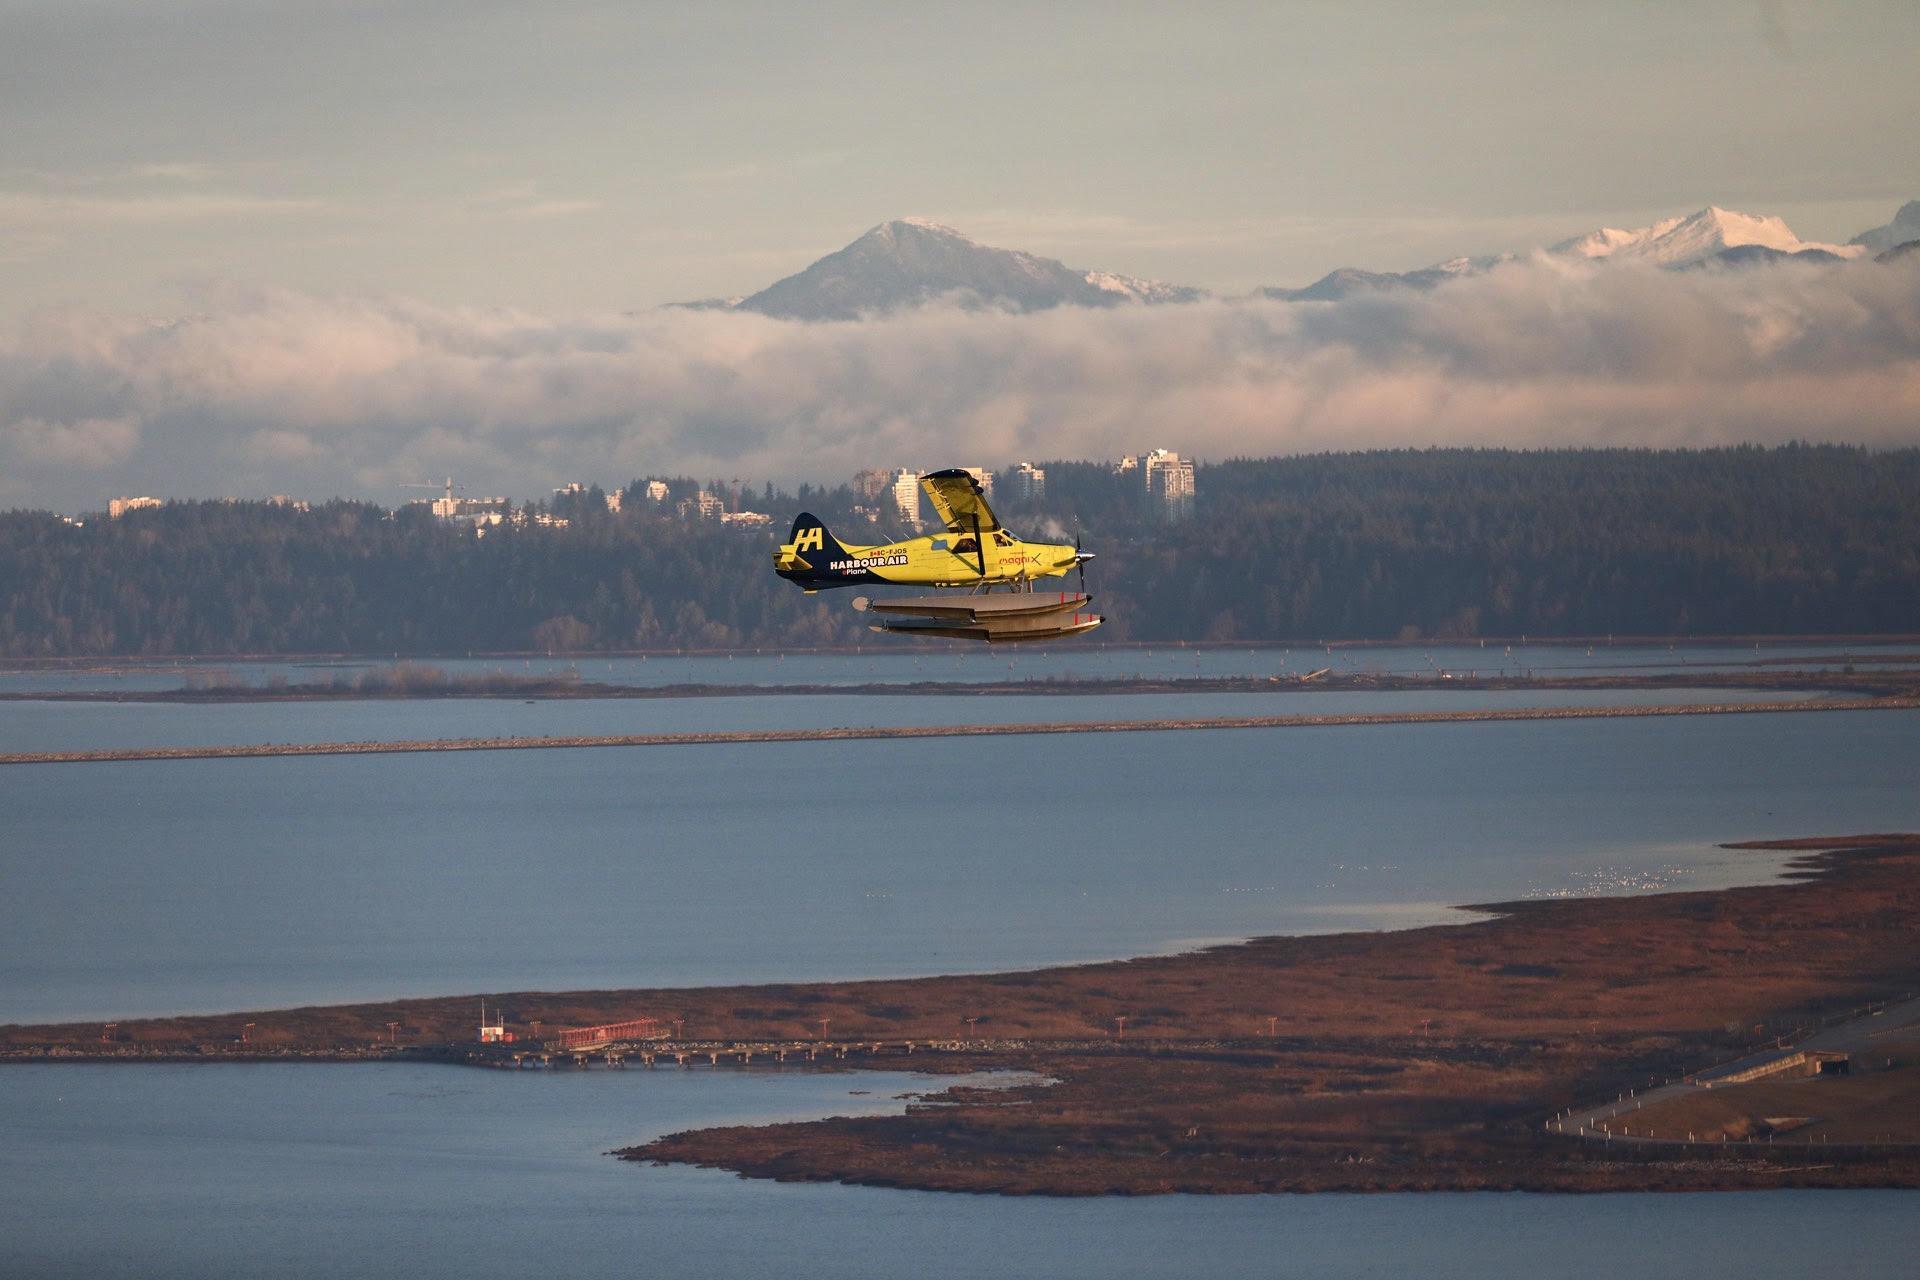 www.flightglobal.com